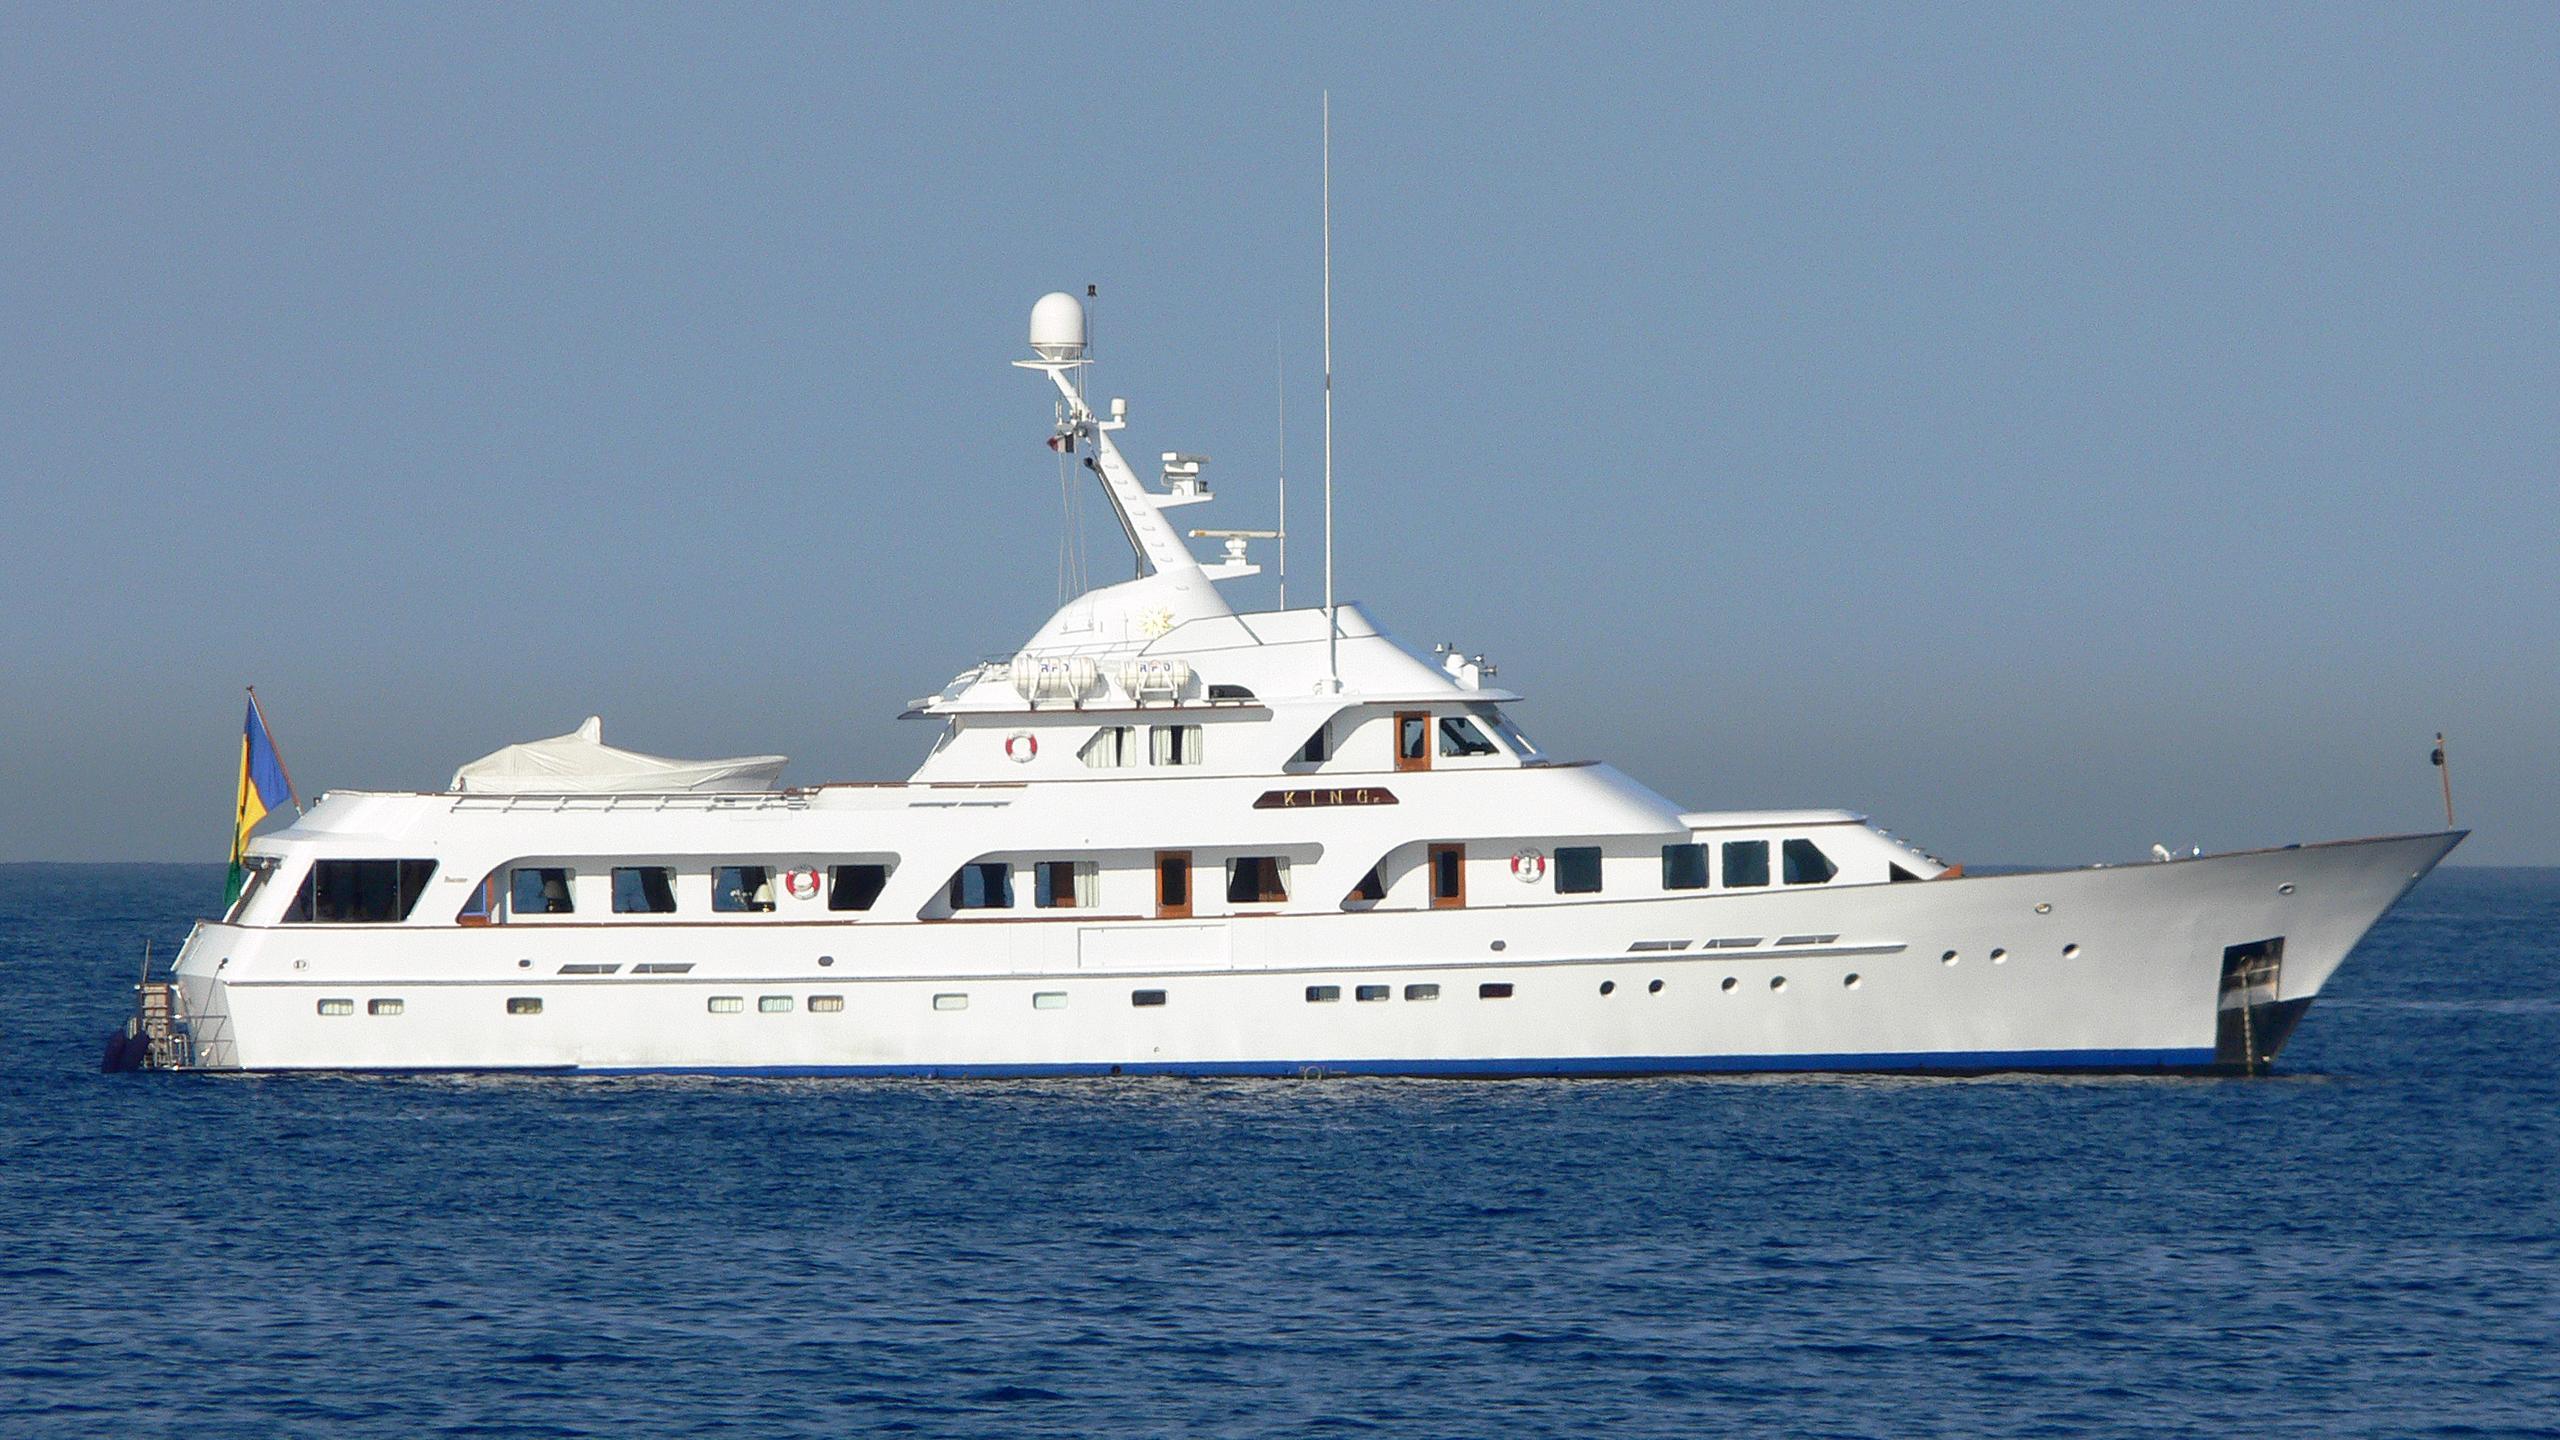 king-k-motor-yacht-feadship-1981-42m-profile